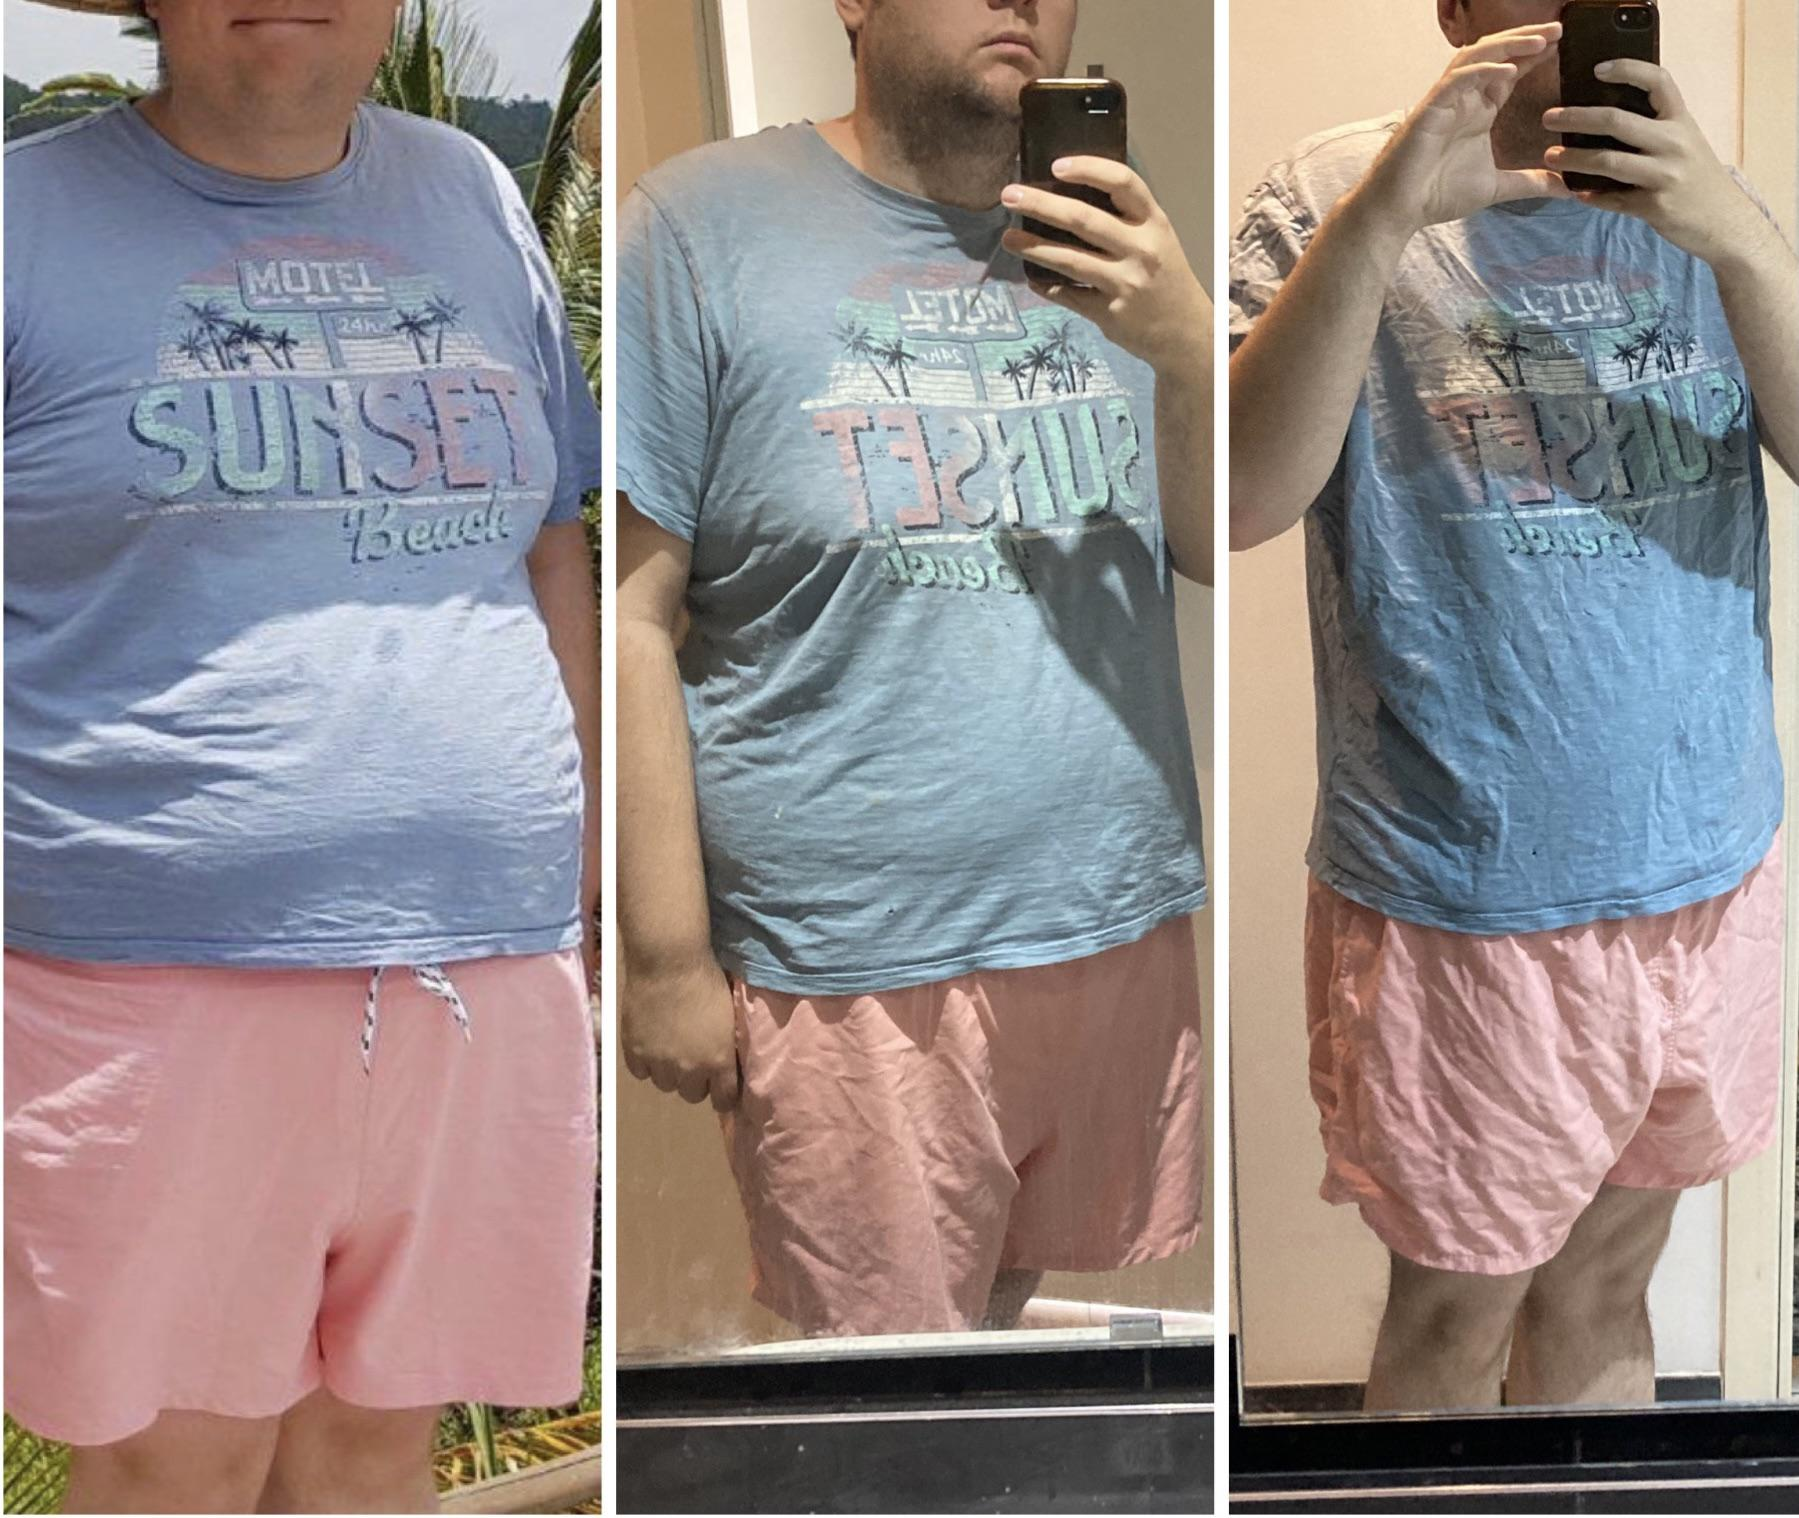 39 lbs Weight Loss 6 foot 1 Male 317 lbs to 278 lbs